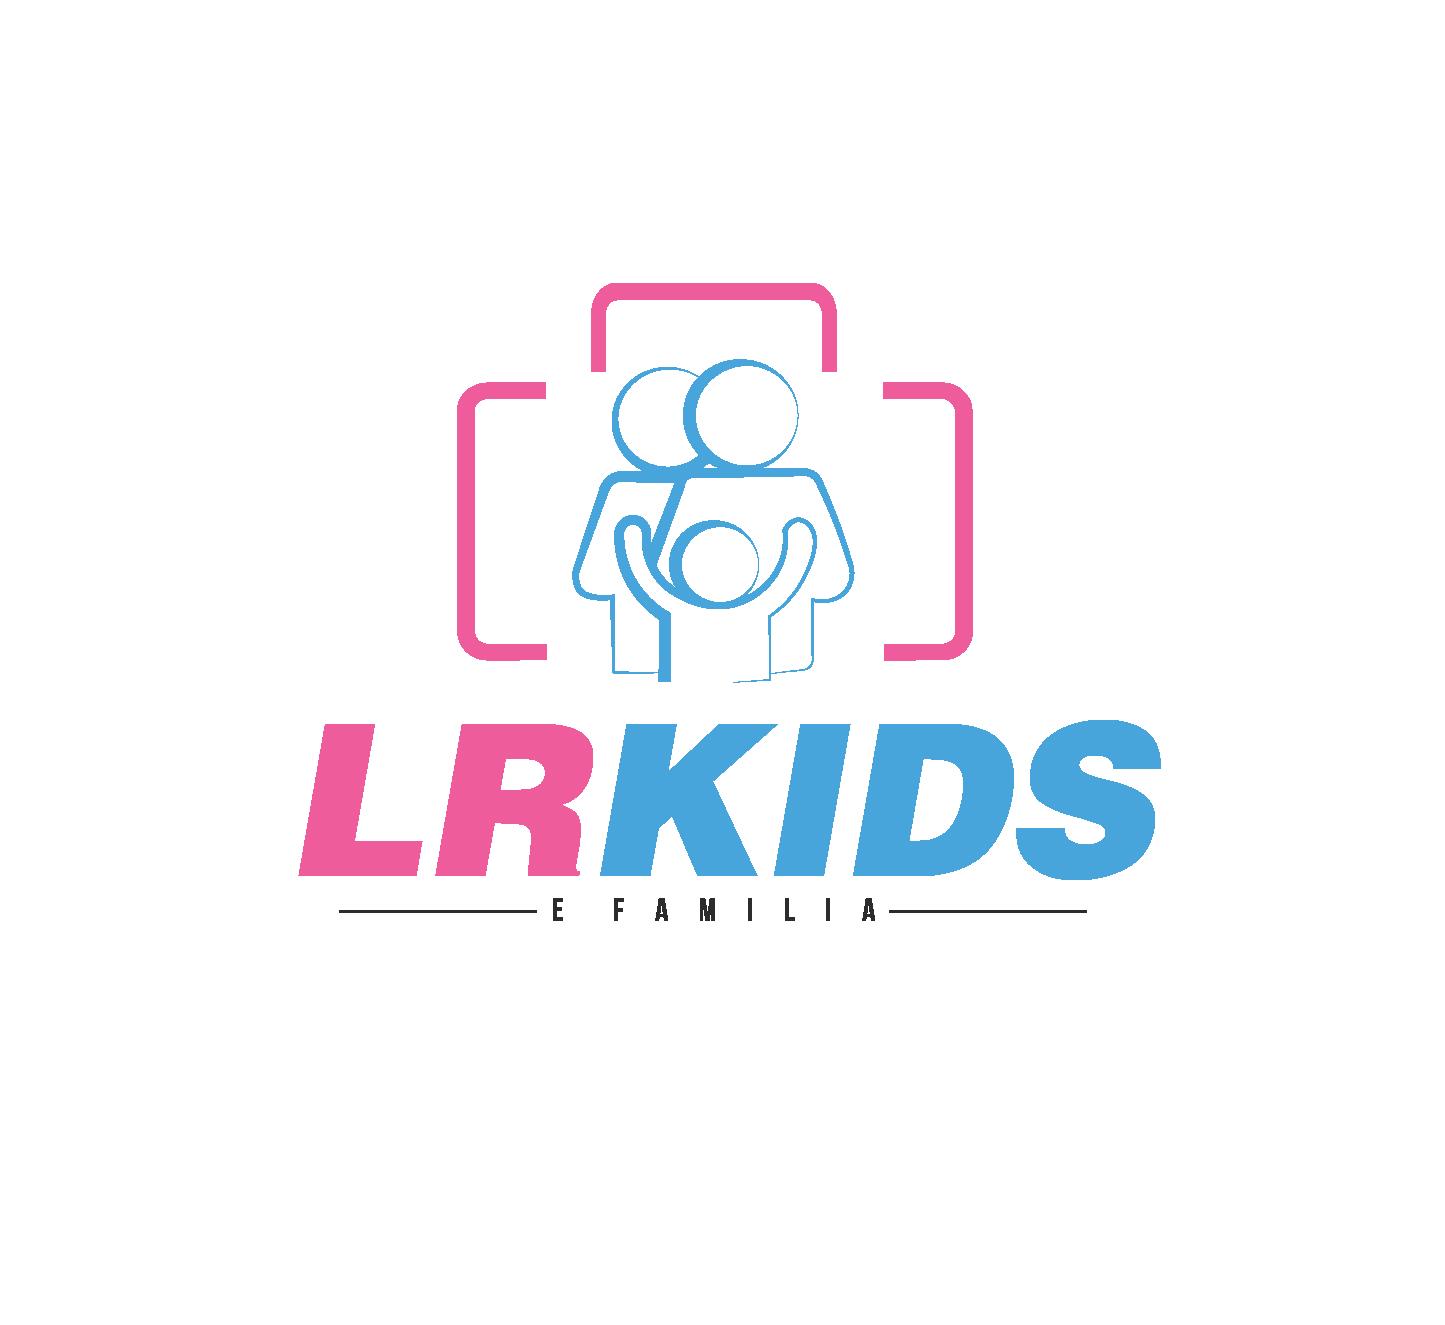 Sobre Fotografia de Aniversário infantil e Familía - SP - Especializados em aniversário Infantil - LRKidseFamilia